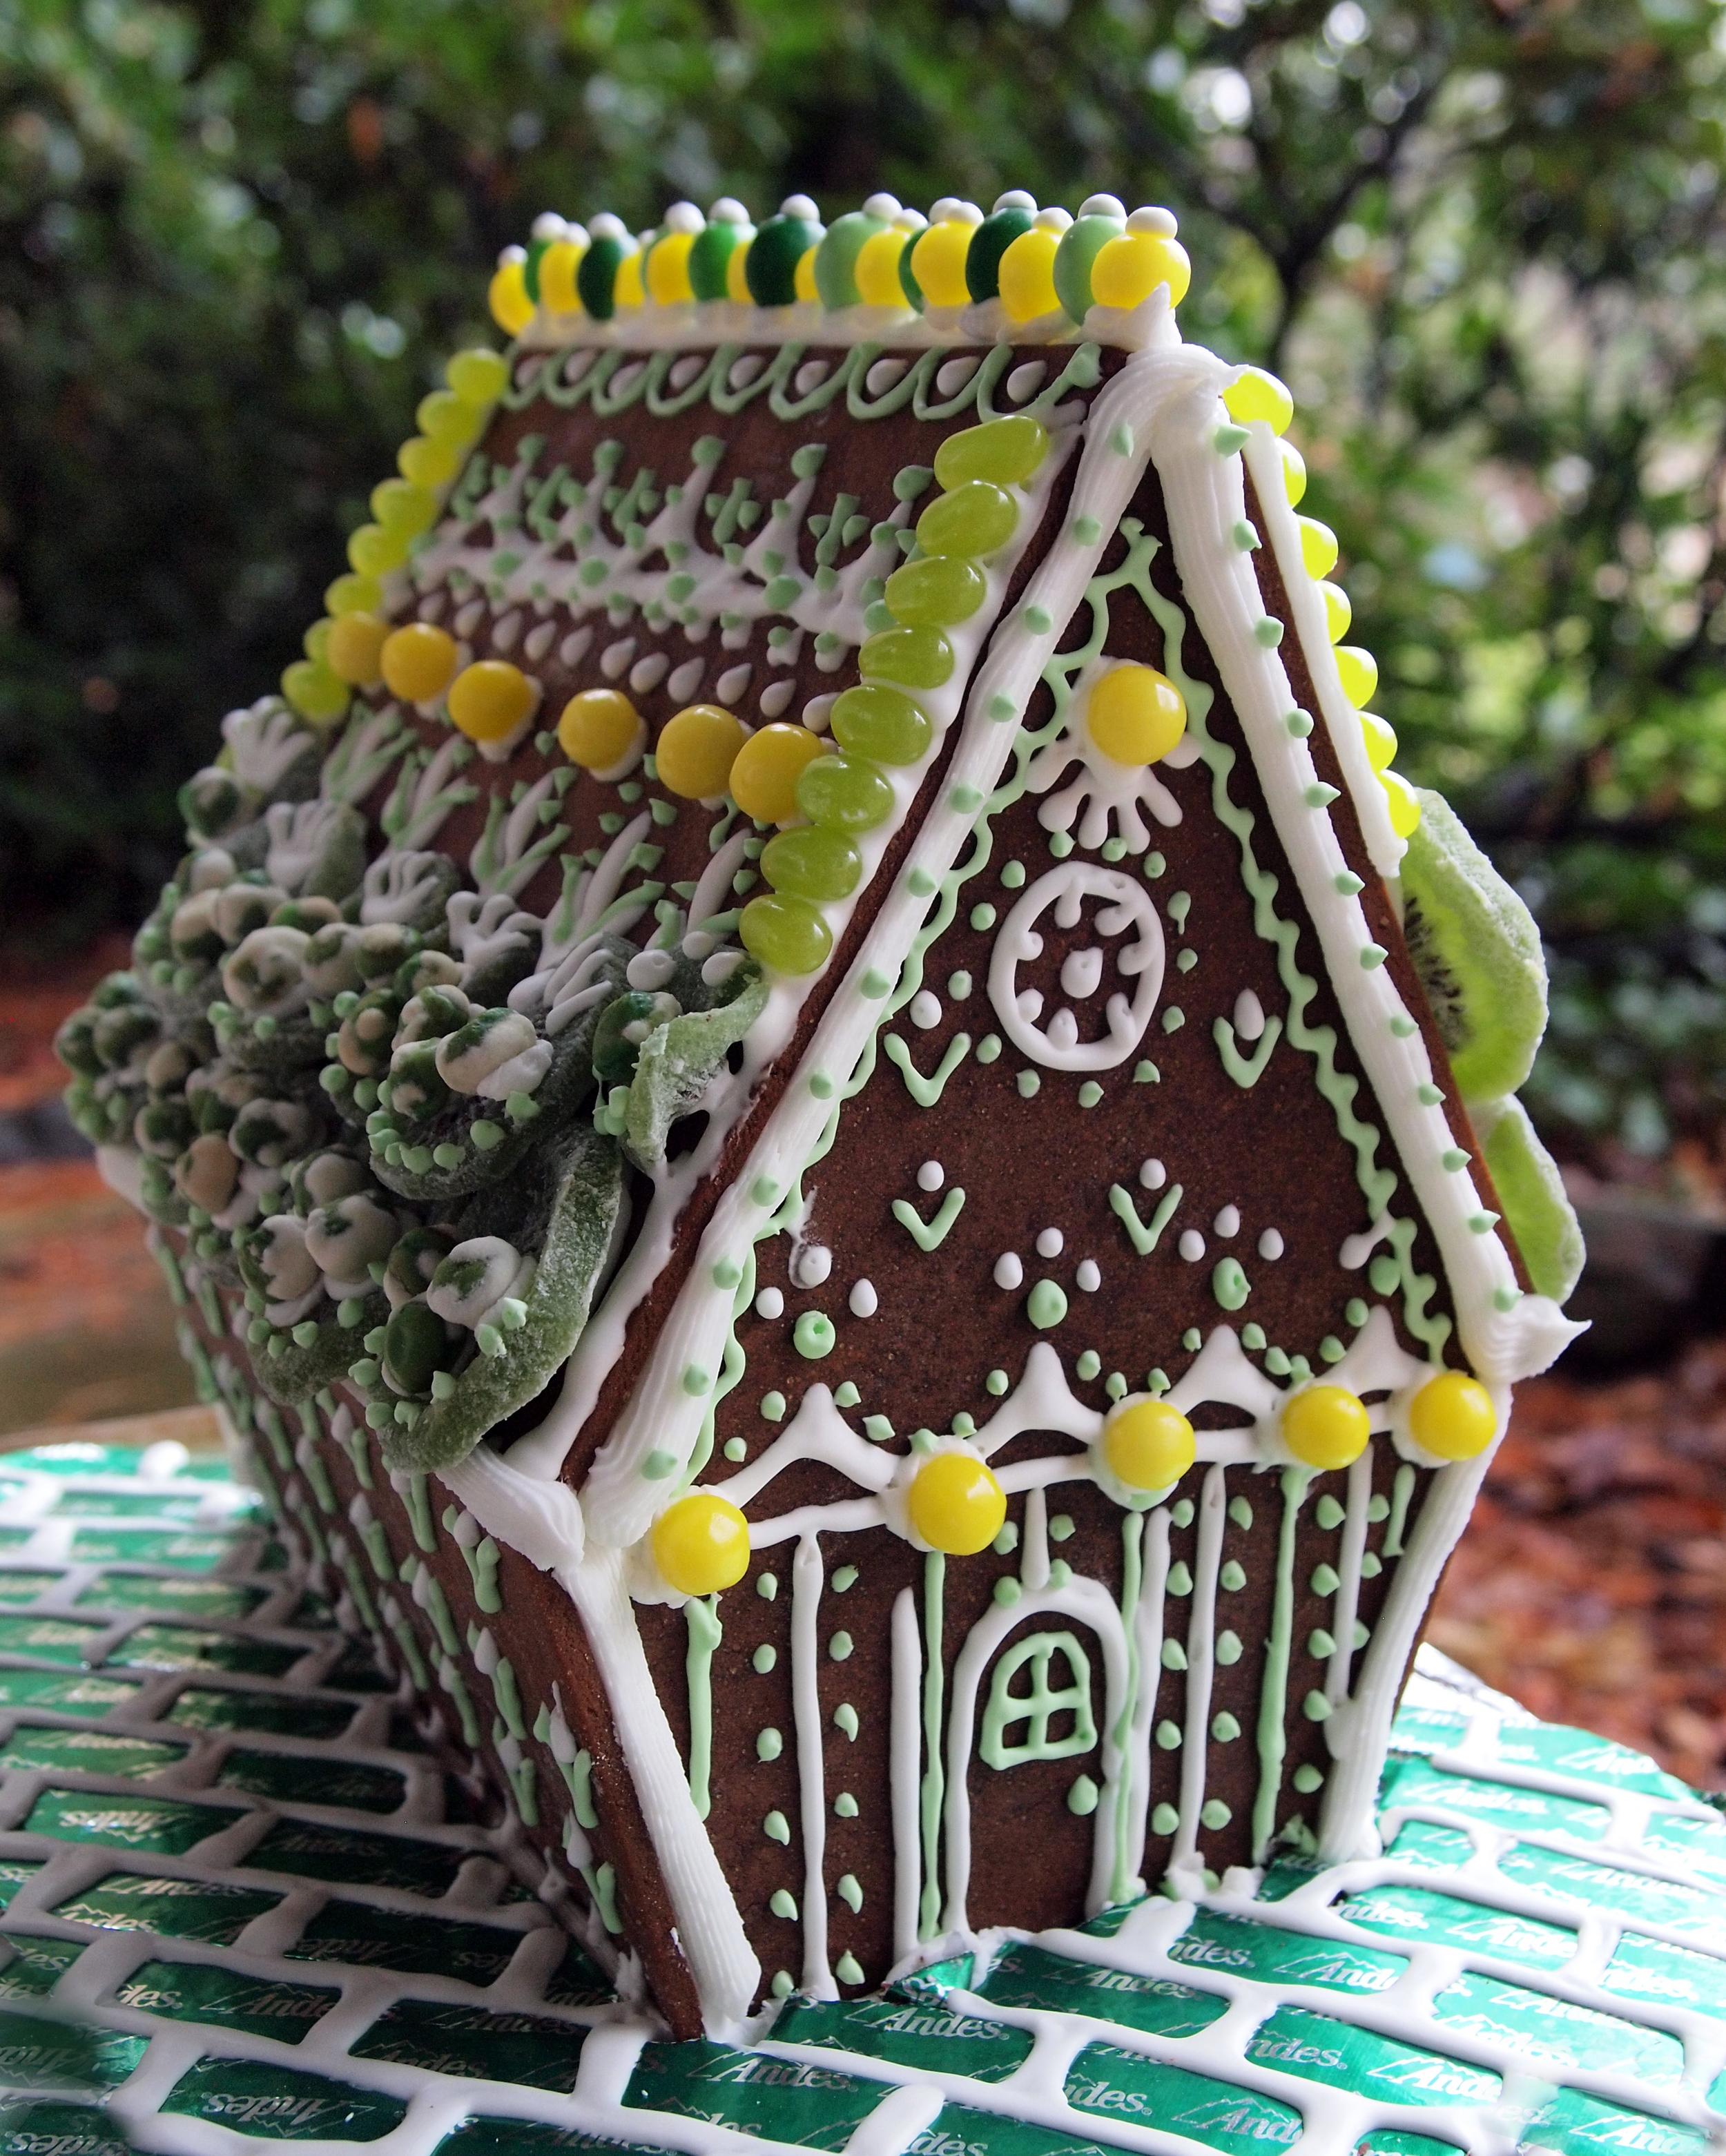 green_gingerbread house.jpg